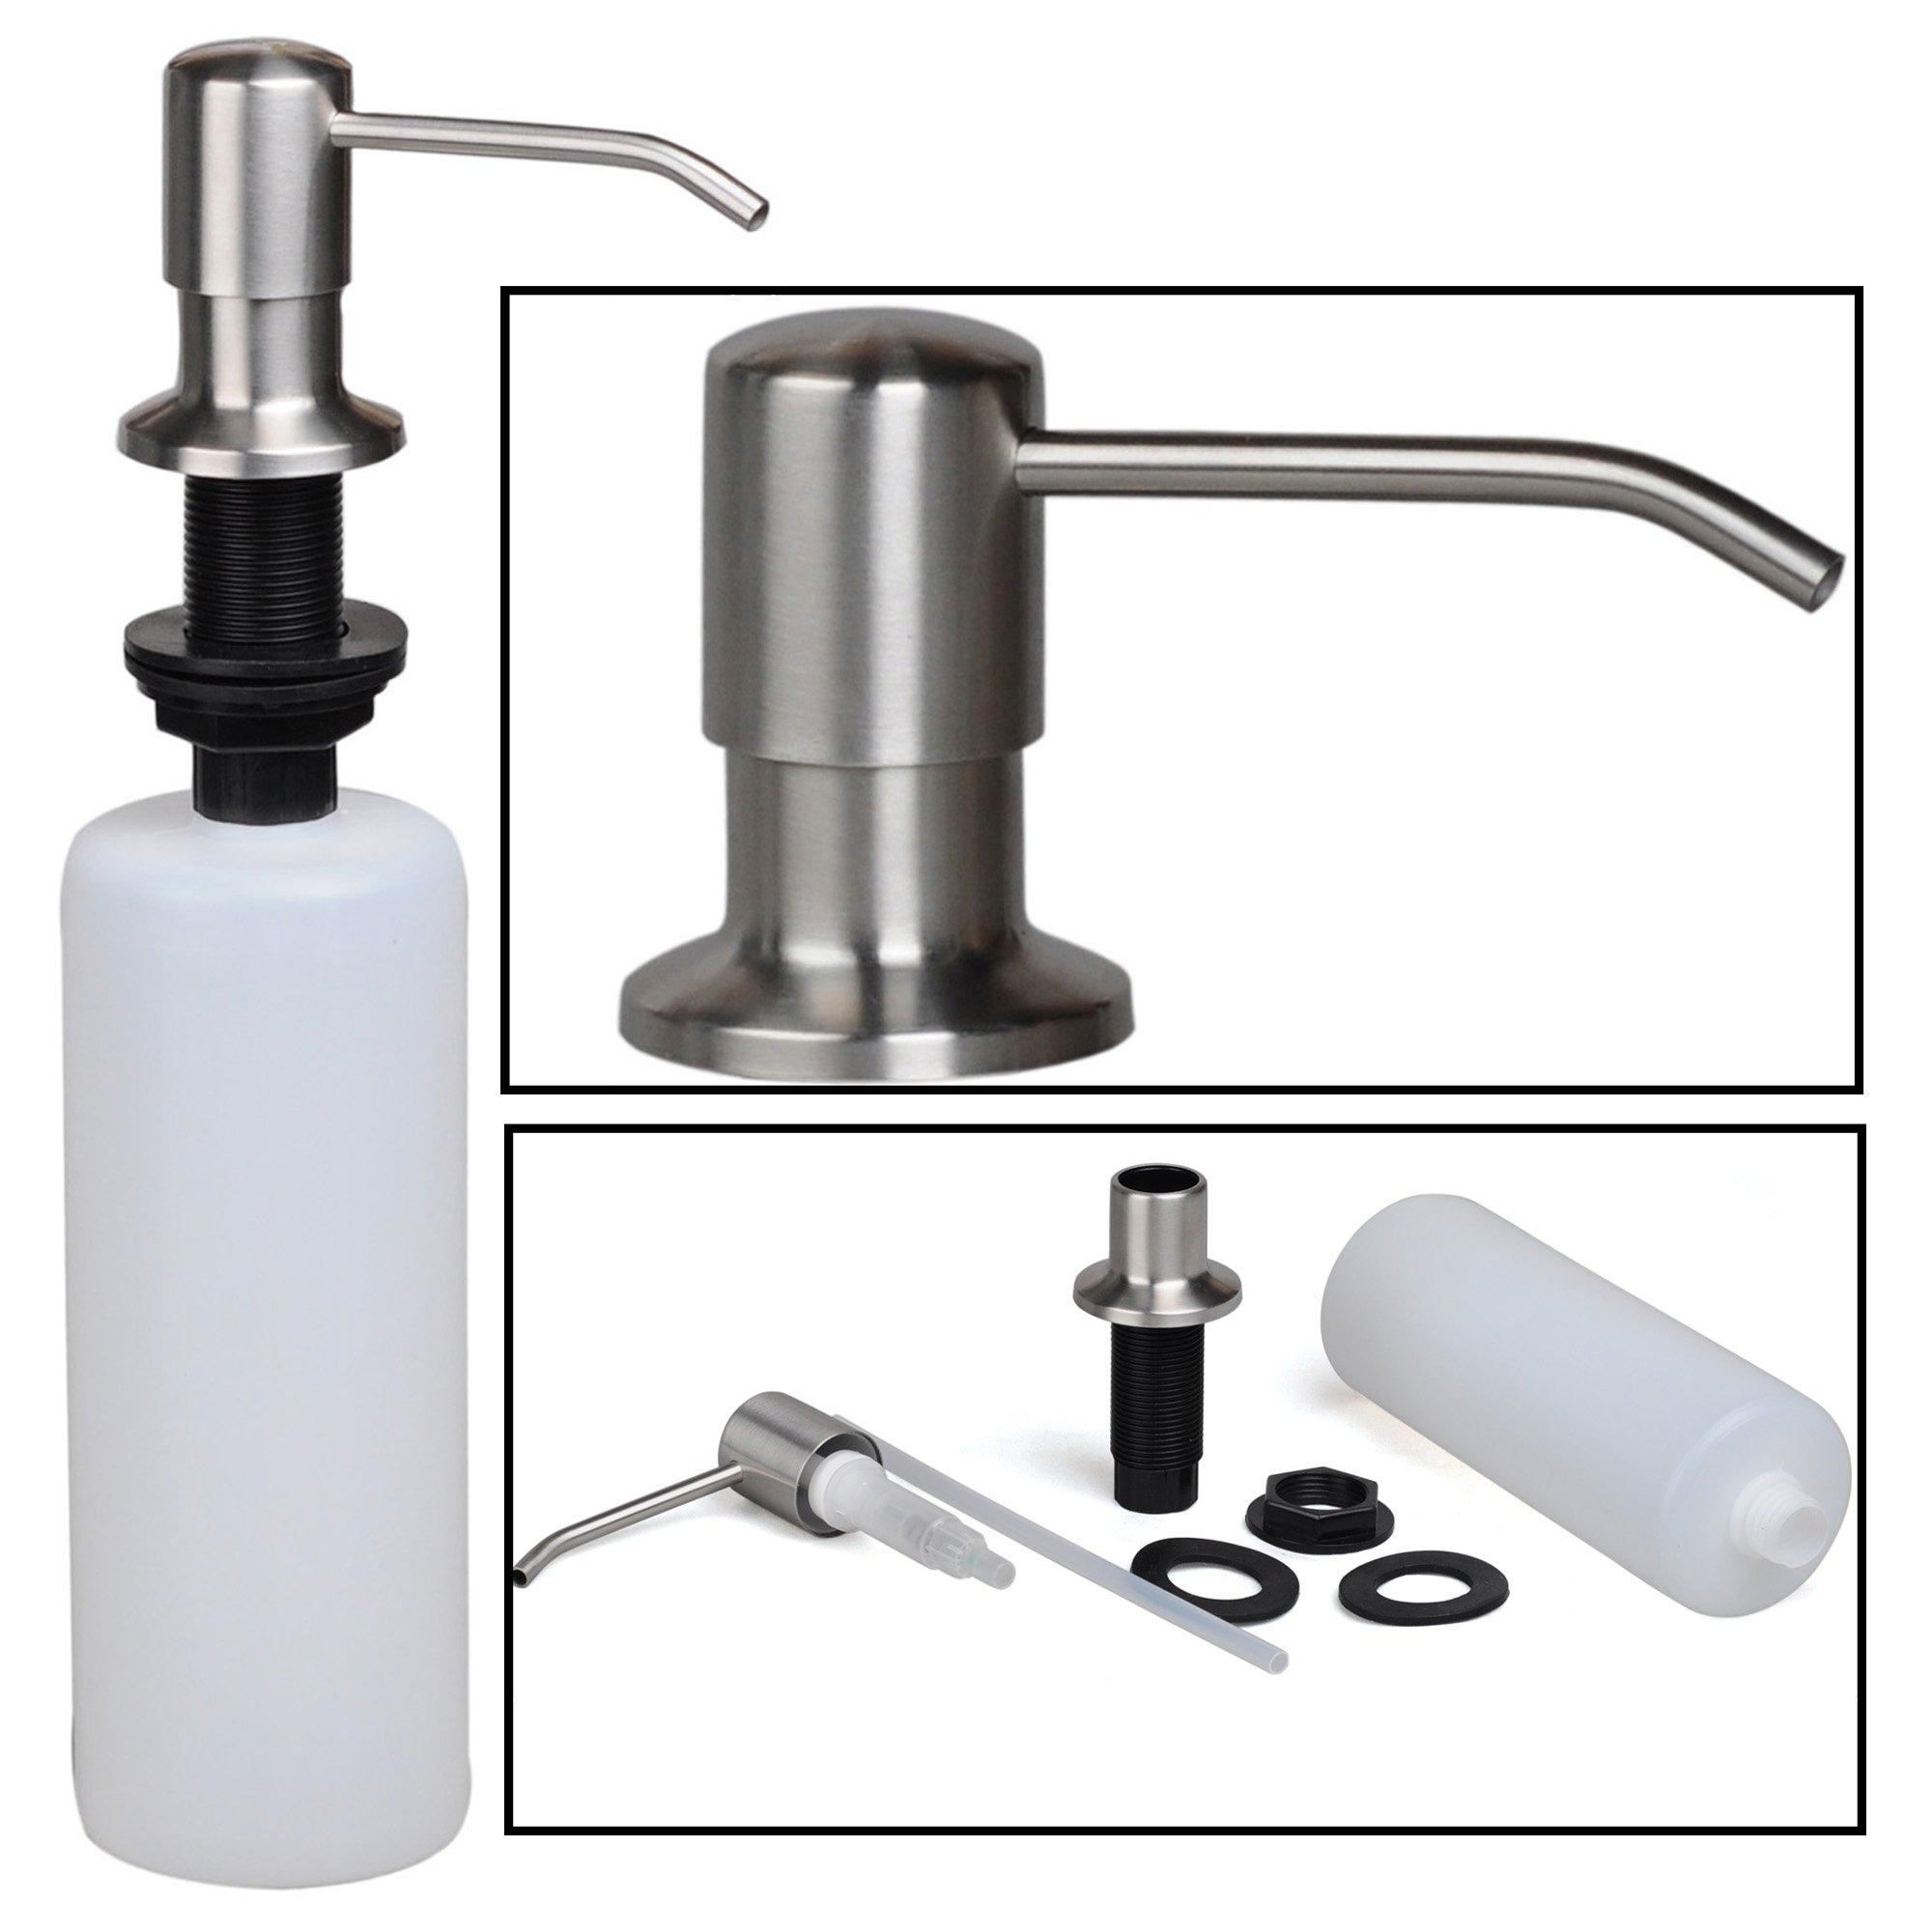 stainless steel built in pump kitchen sink dish soap dispenser large capacity 613894773297 ebay. Black Bedroom Furniture Sets. Home Design Ideas